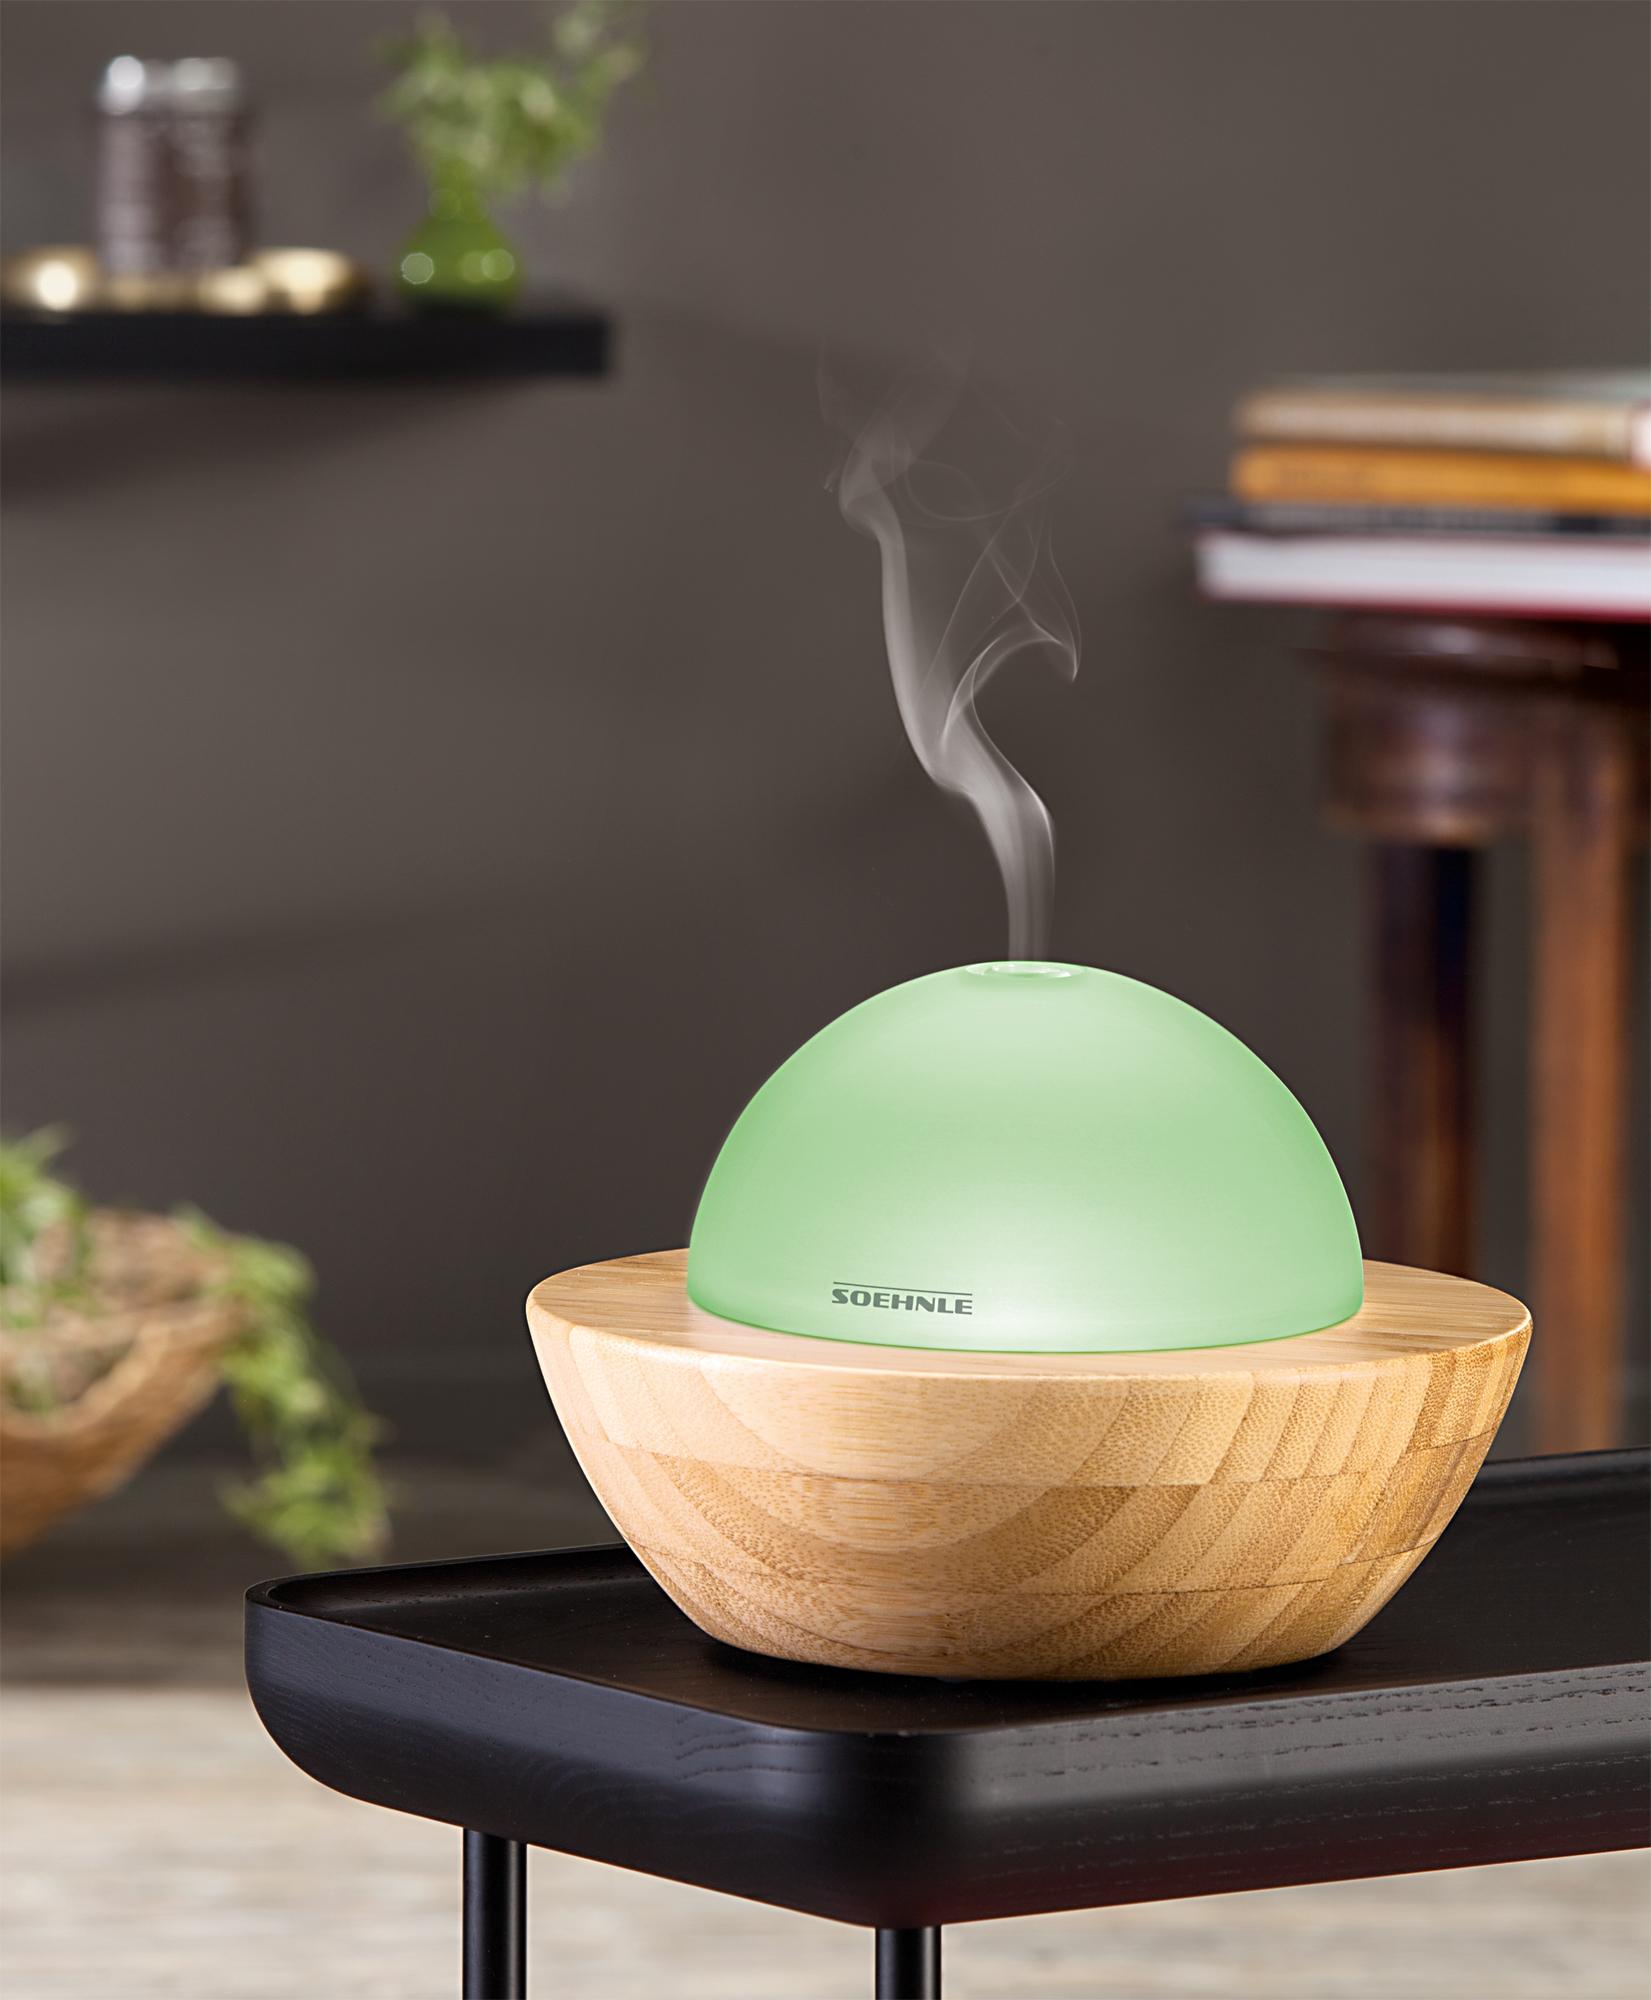 soehnle aroma diffuser modena. Black Bedroom Furniture Sets. Home Design Ideas